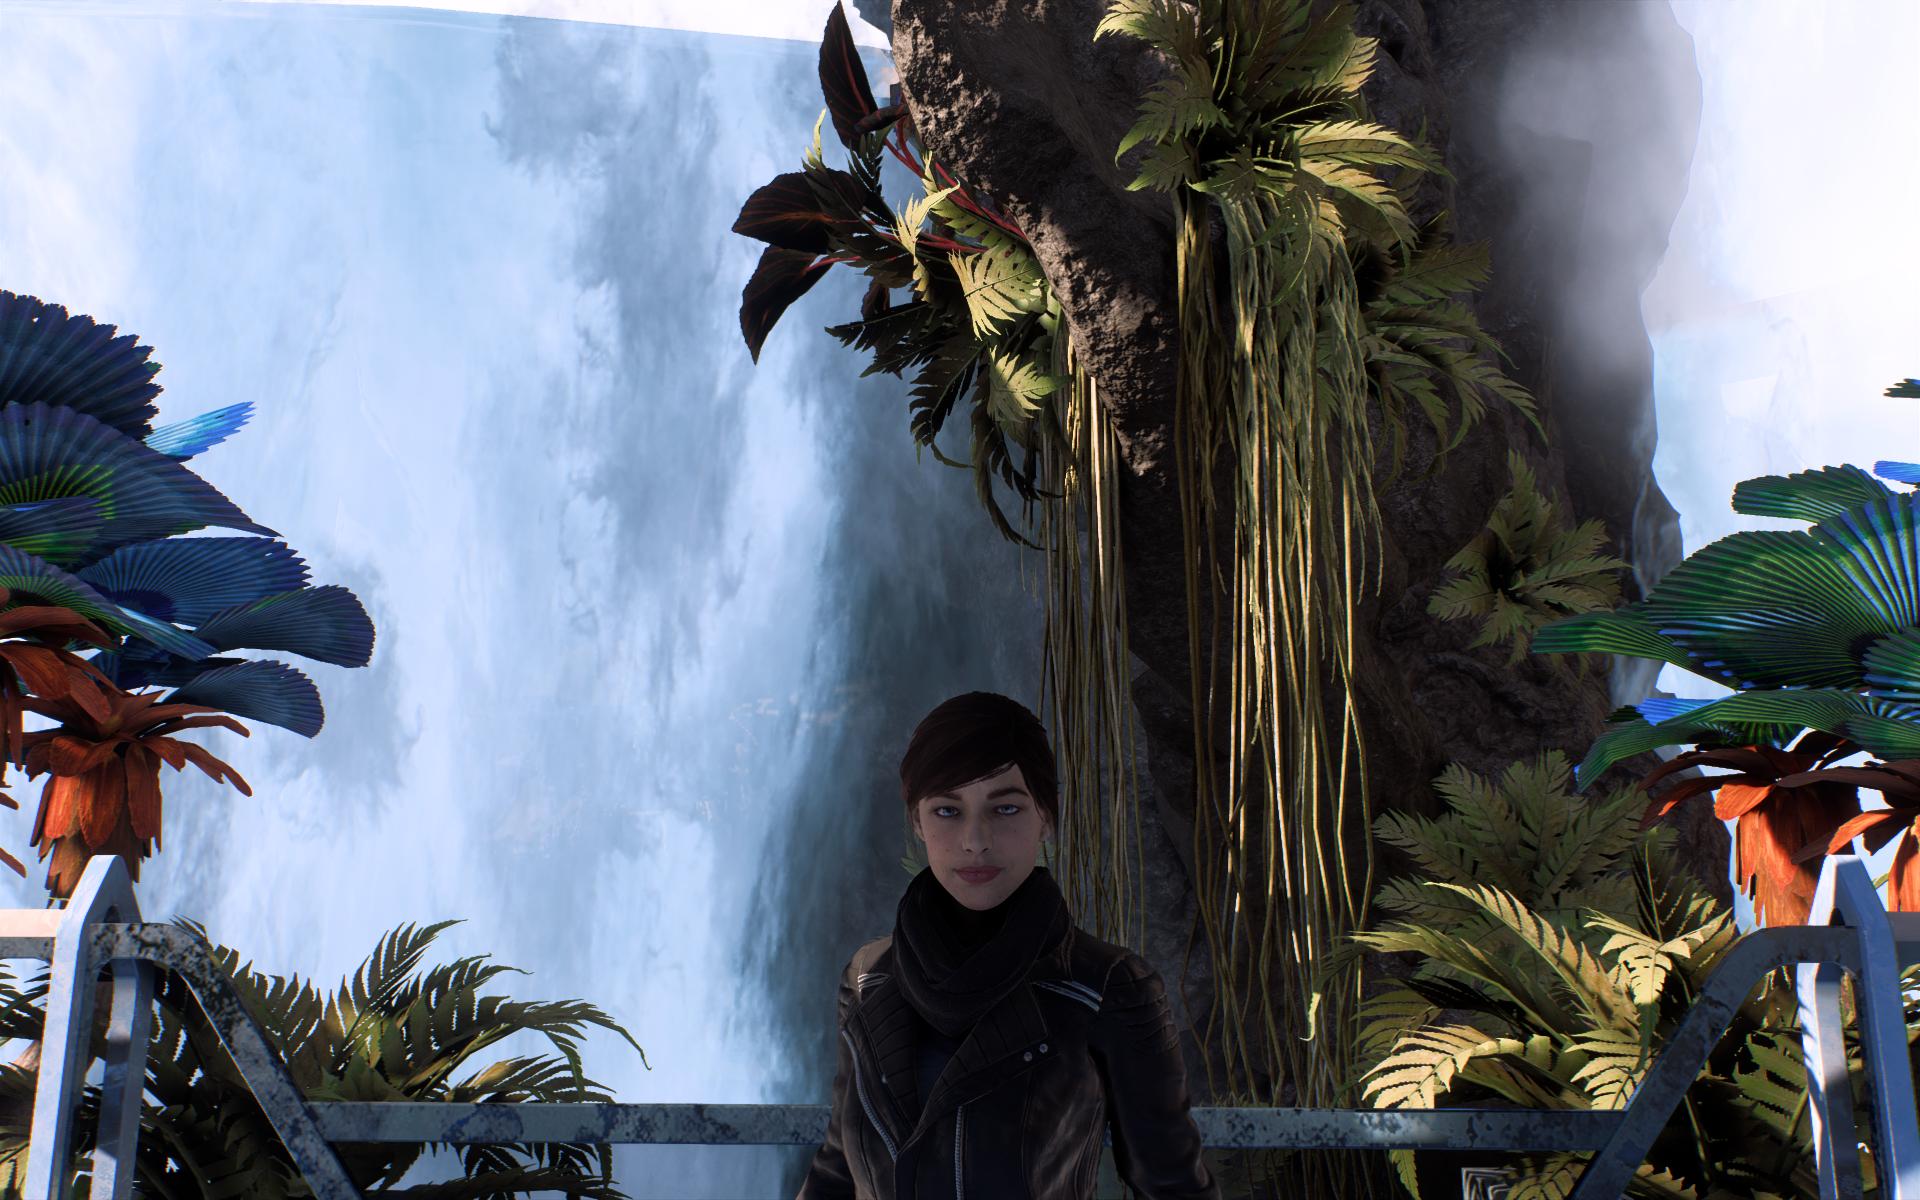 Mass Effect Andromeda Screenshot  - 08.02.02.52.png - Mass Effect: Andromeda